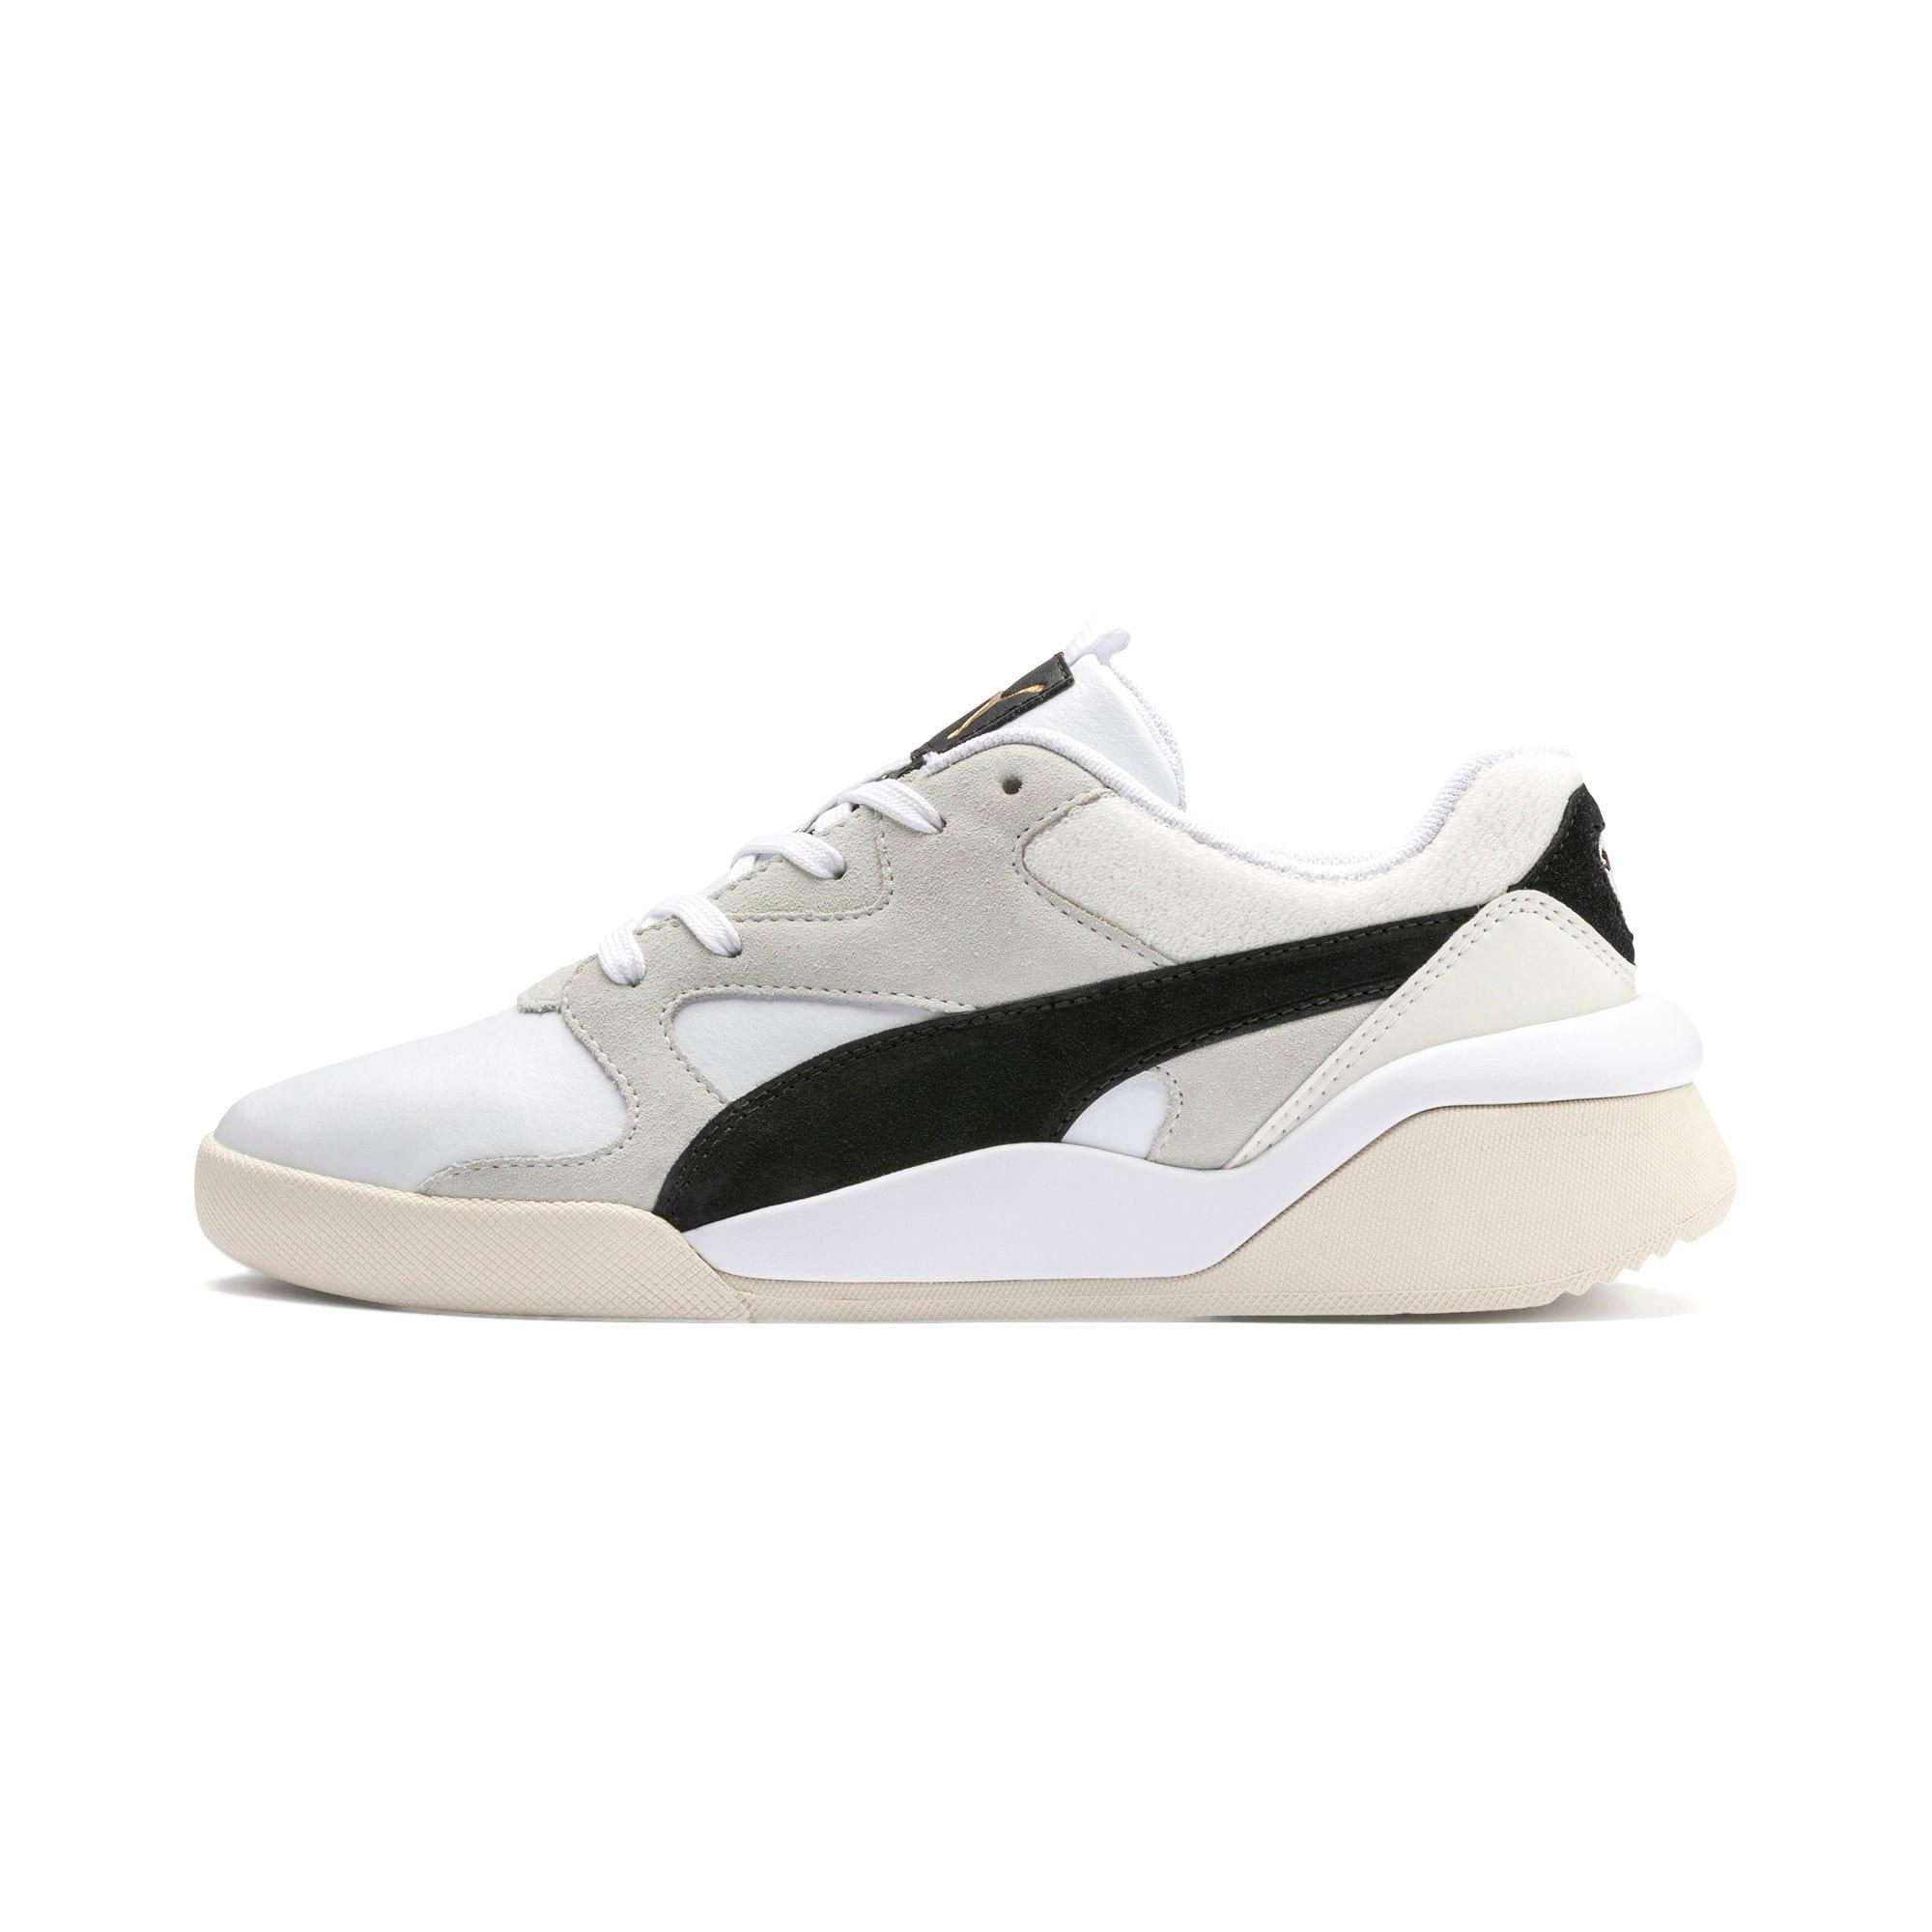 Thumbnail 1 of Aeon Heritage Women's Sneakers, Puma White-Puma Black, medium